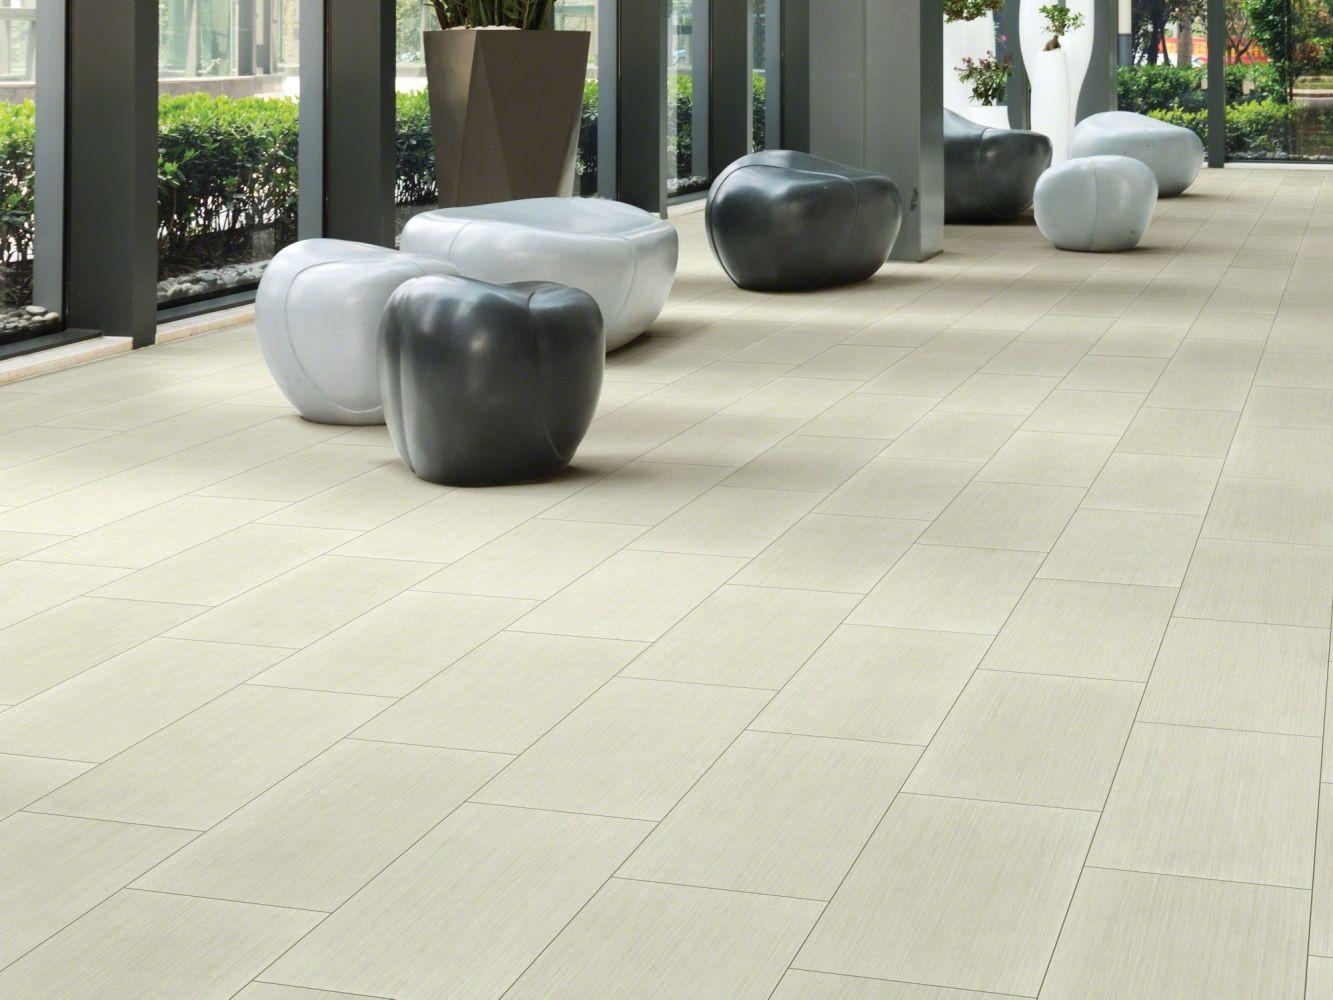 Shaw Floors Nfa HS Beaver Creek Tile Arid 00162_VH546